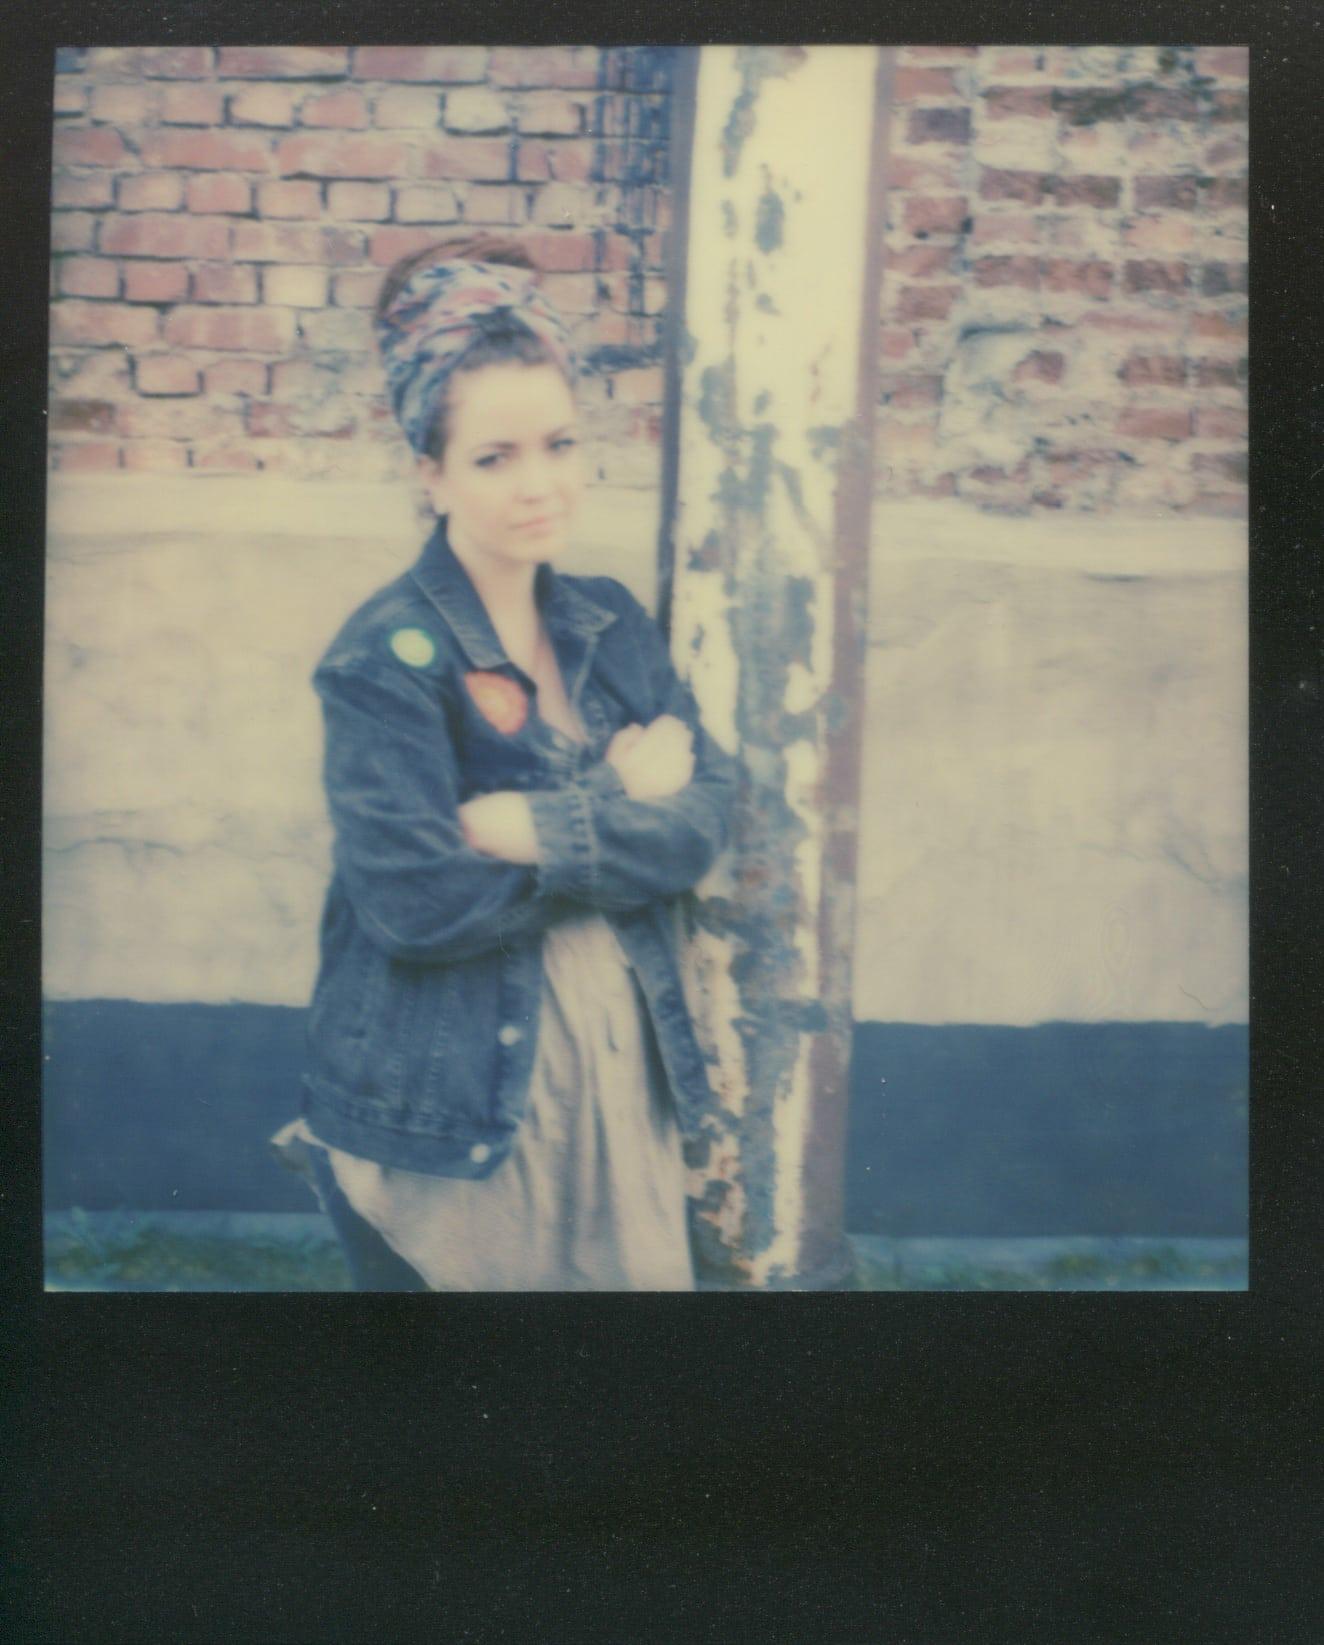 Anna in Polaroid I